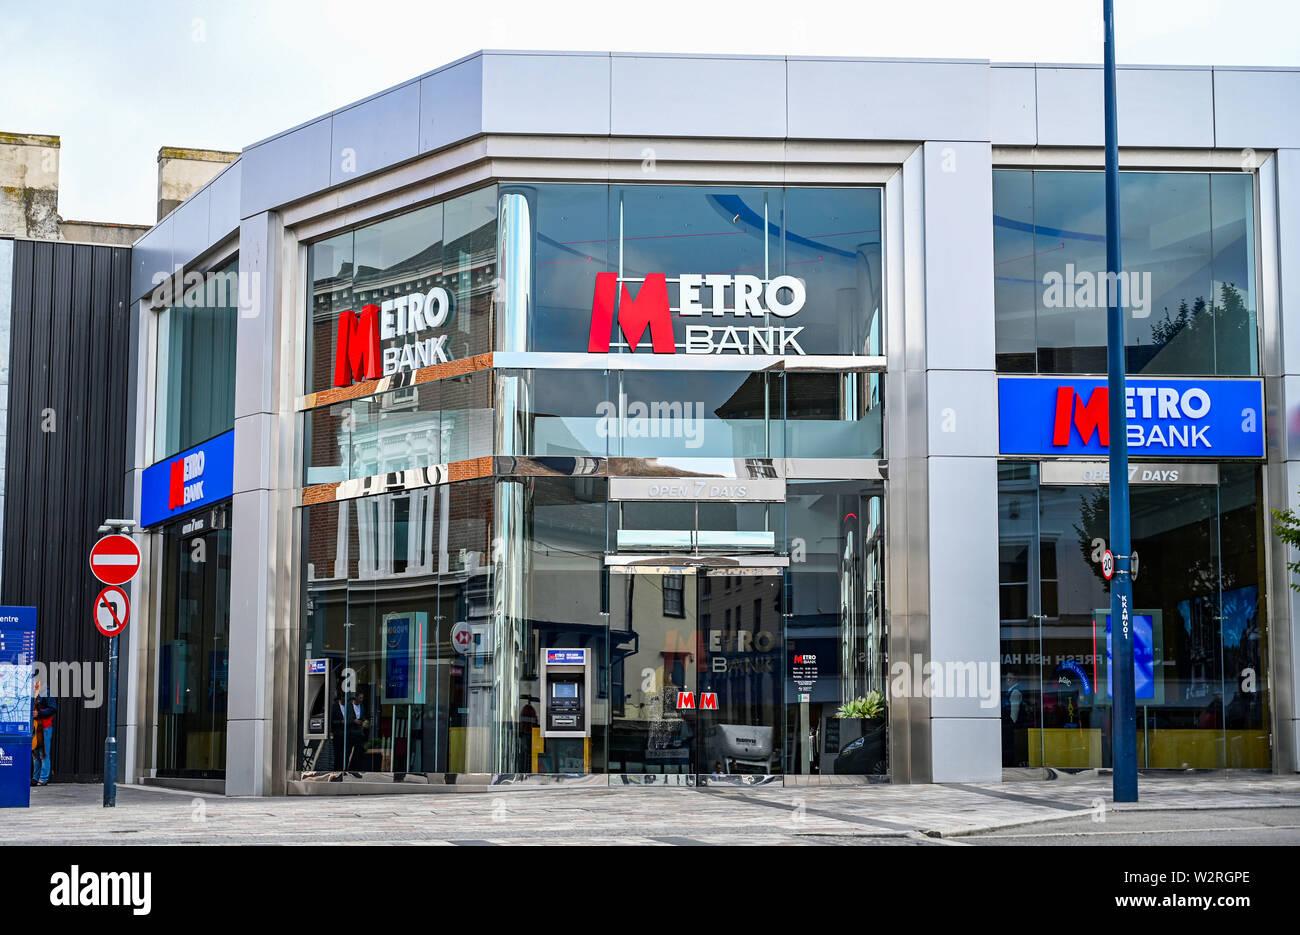 Maidstone Kent UK - The Metro Bank - Stock Image